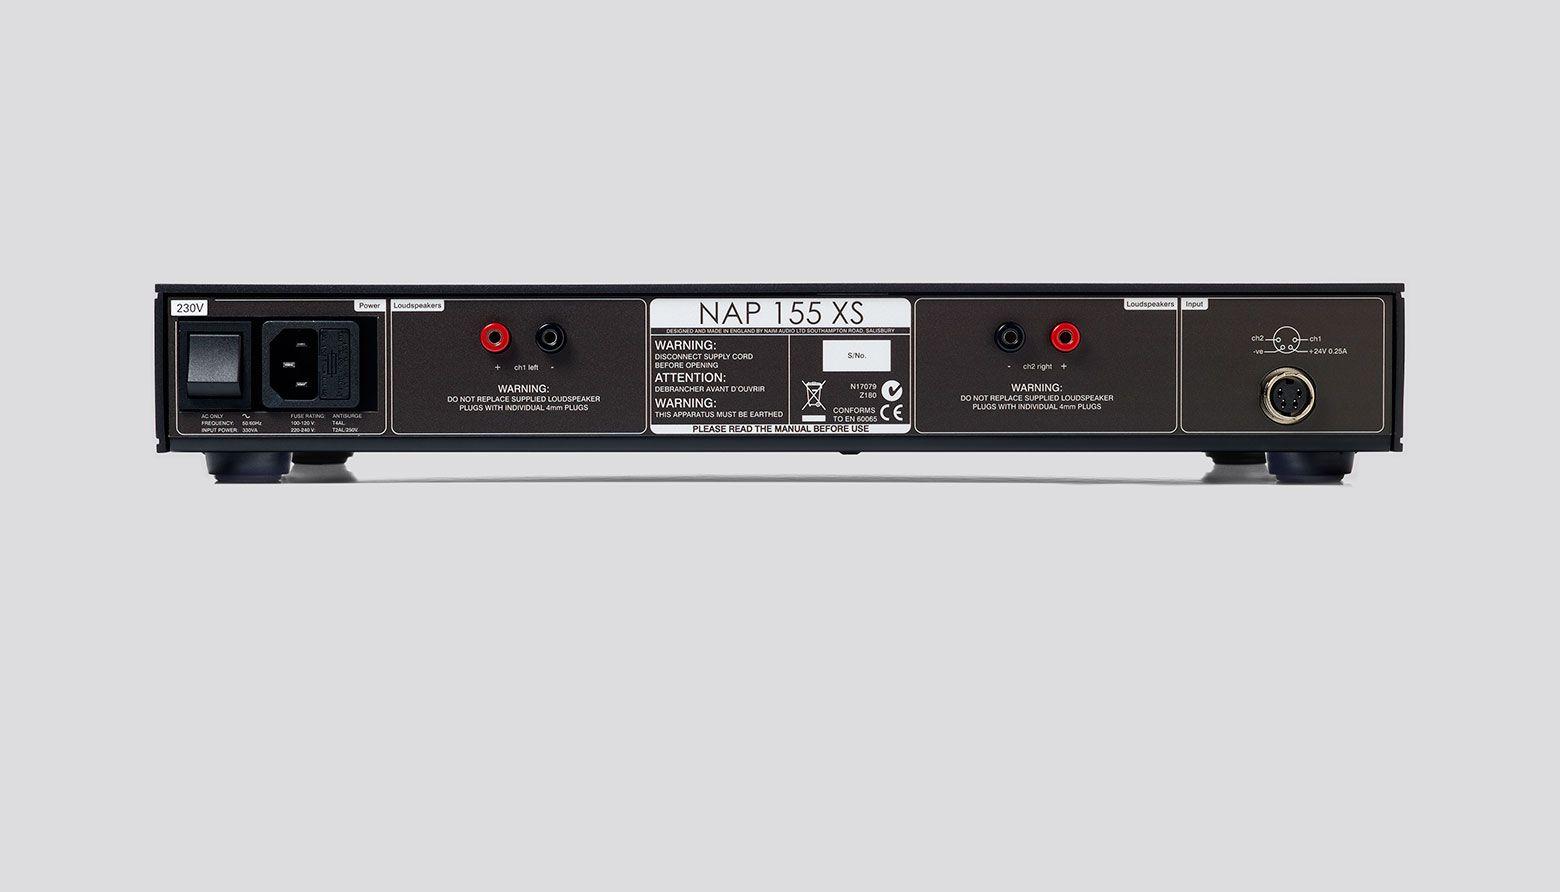 NAP 155 XS Power Amplifier  - Rear View